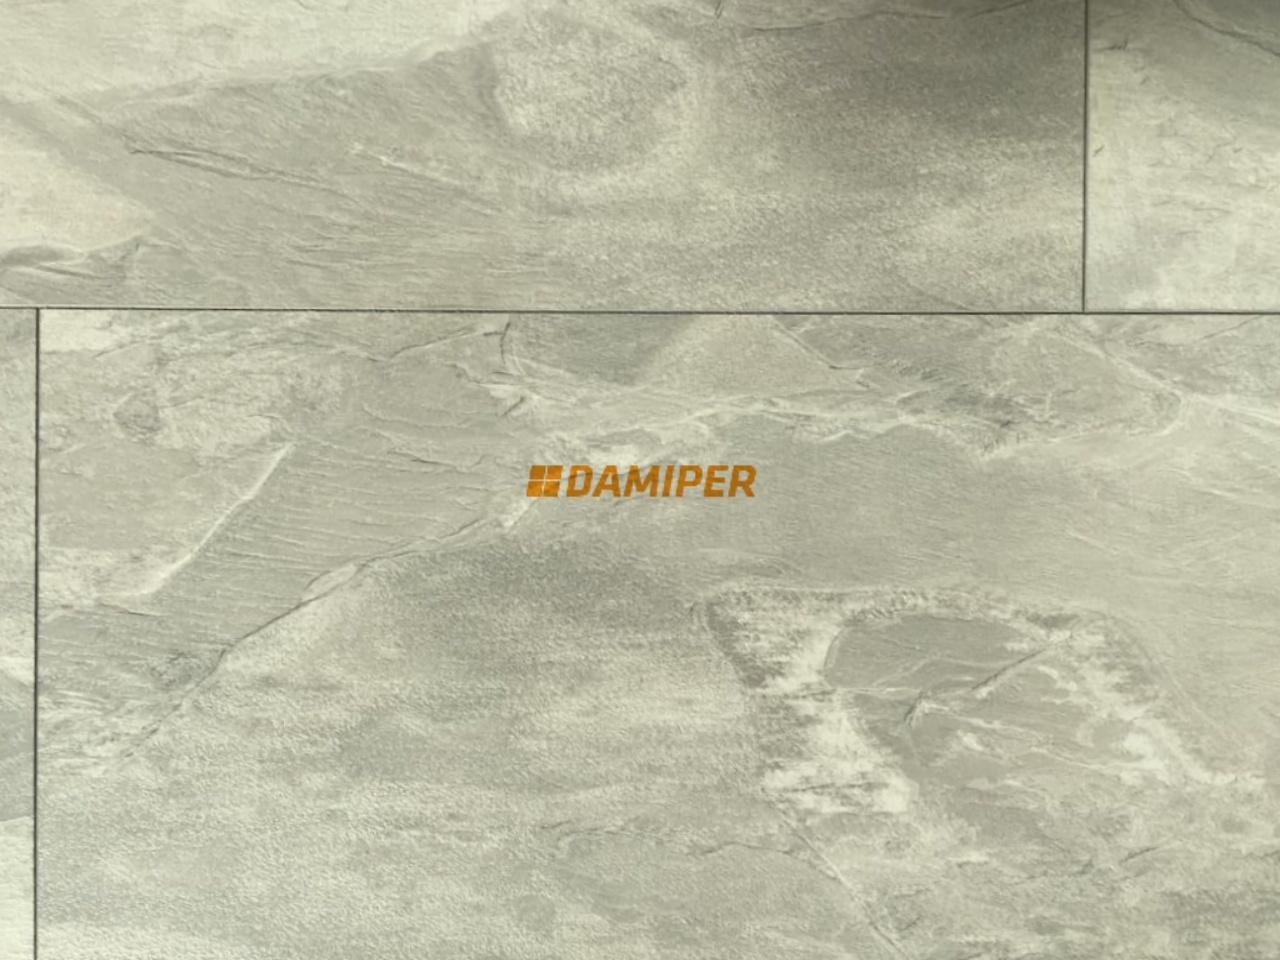 kompozitne_podlahy_h2o_floor_kronooriginal_1527_bridlica_amazon_damiper